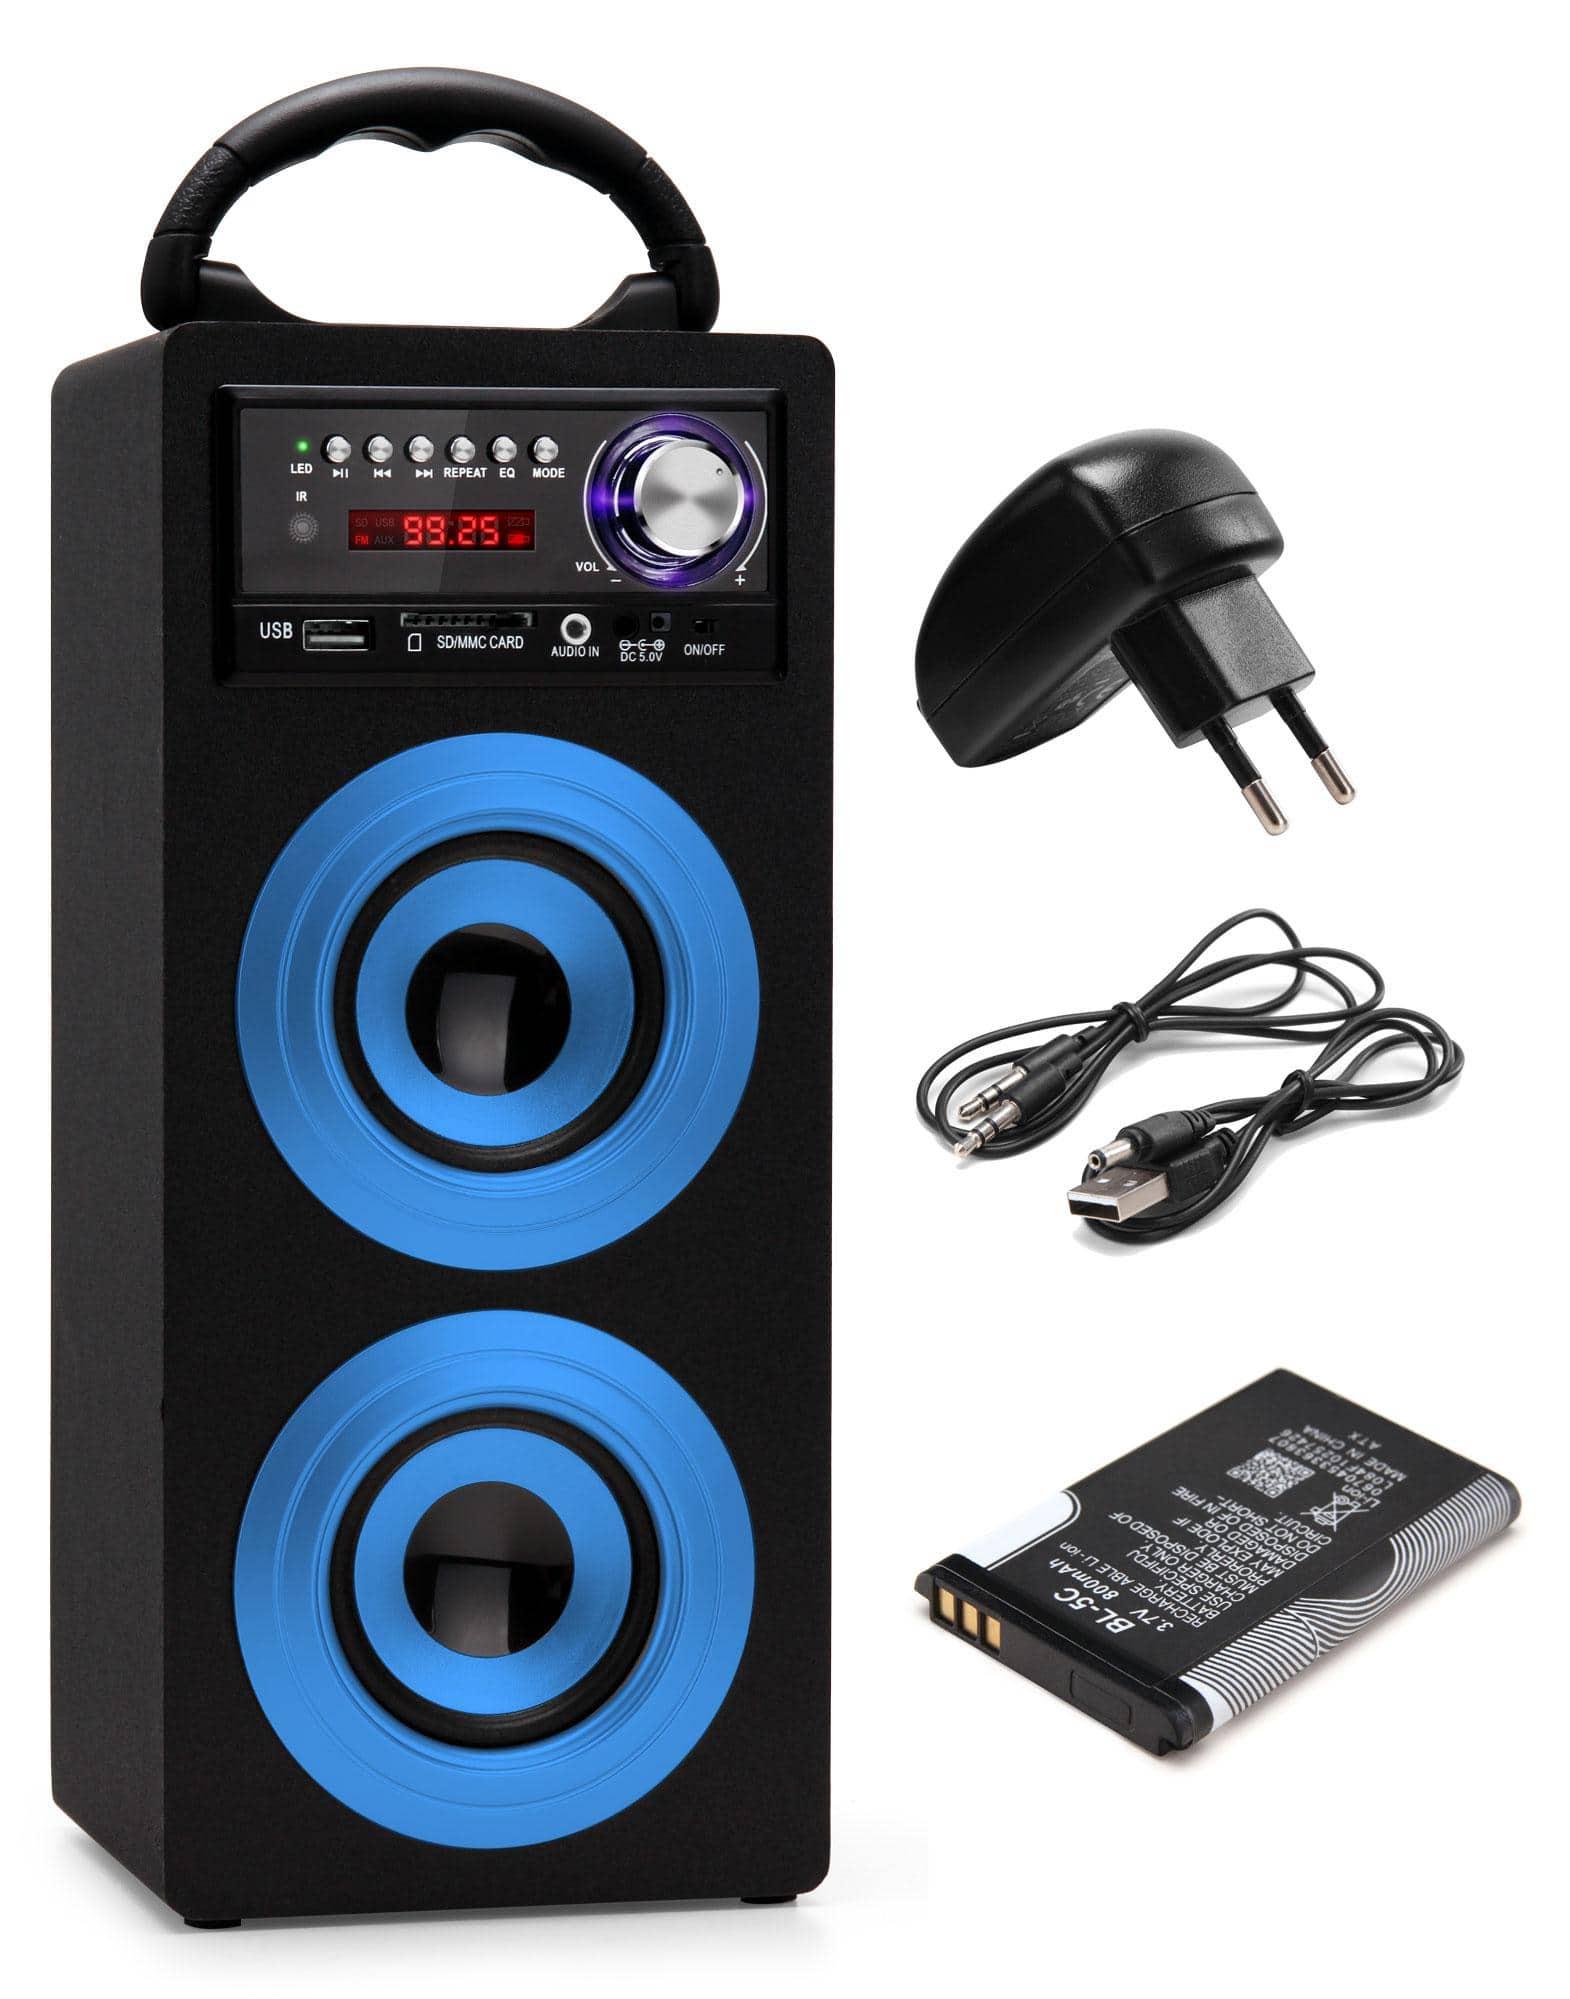 Beatfoxx Beachside Portable Bluetooth Speaker Usb Sd Aux Fm Blue Set Incl Battery Power Cord